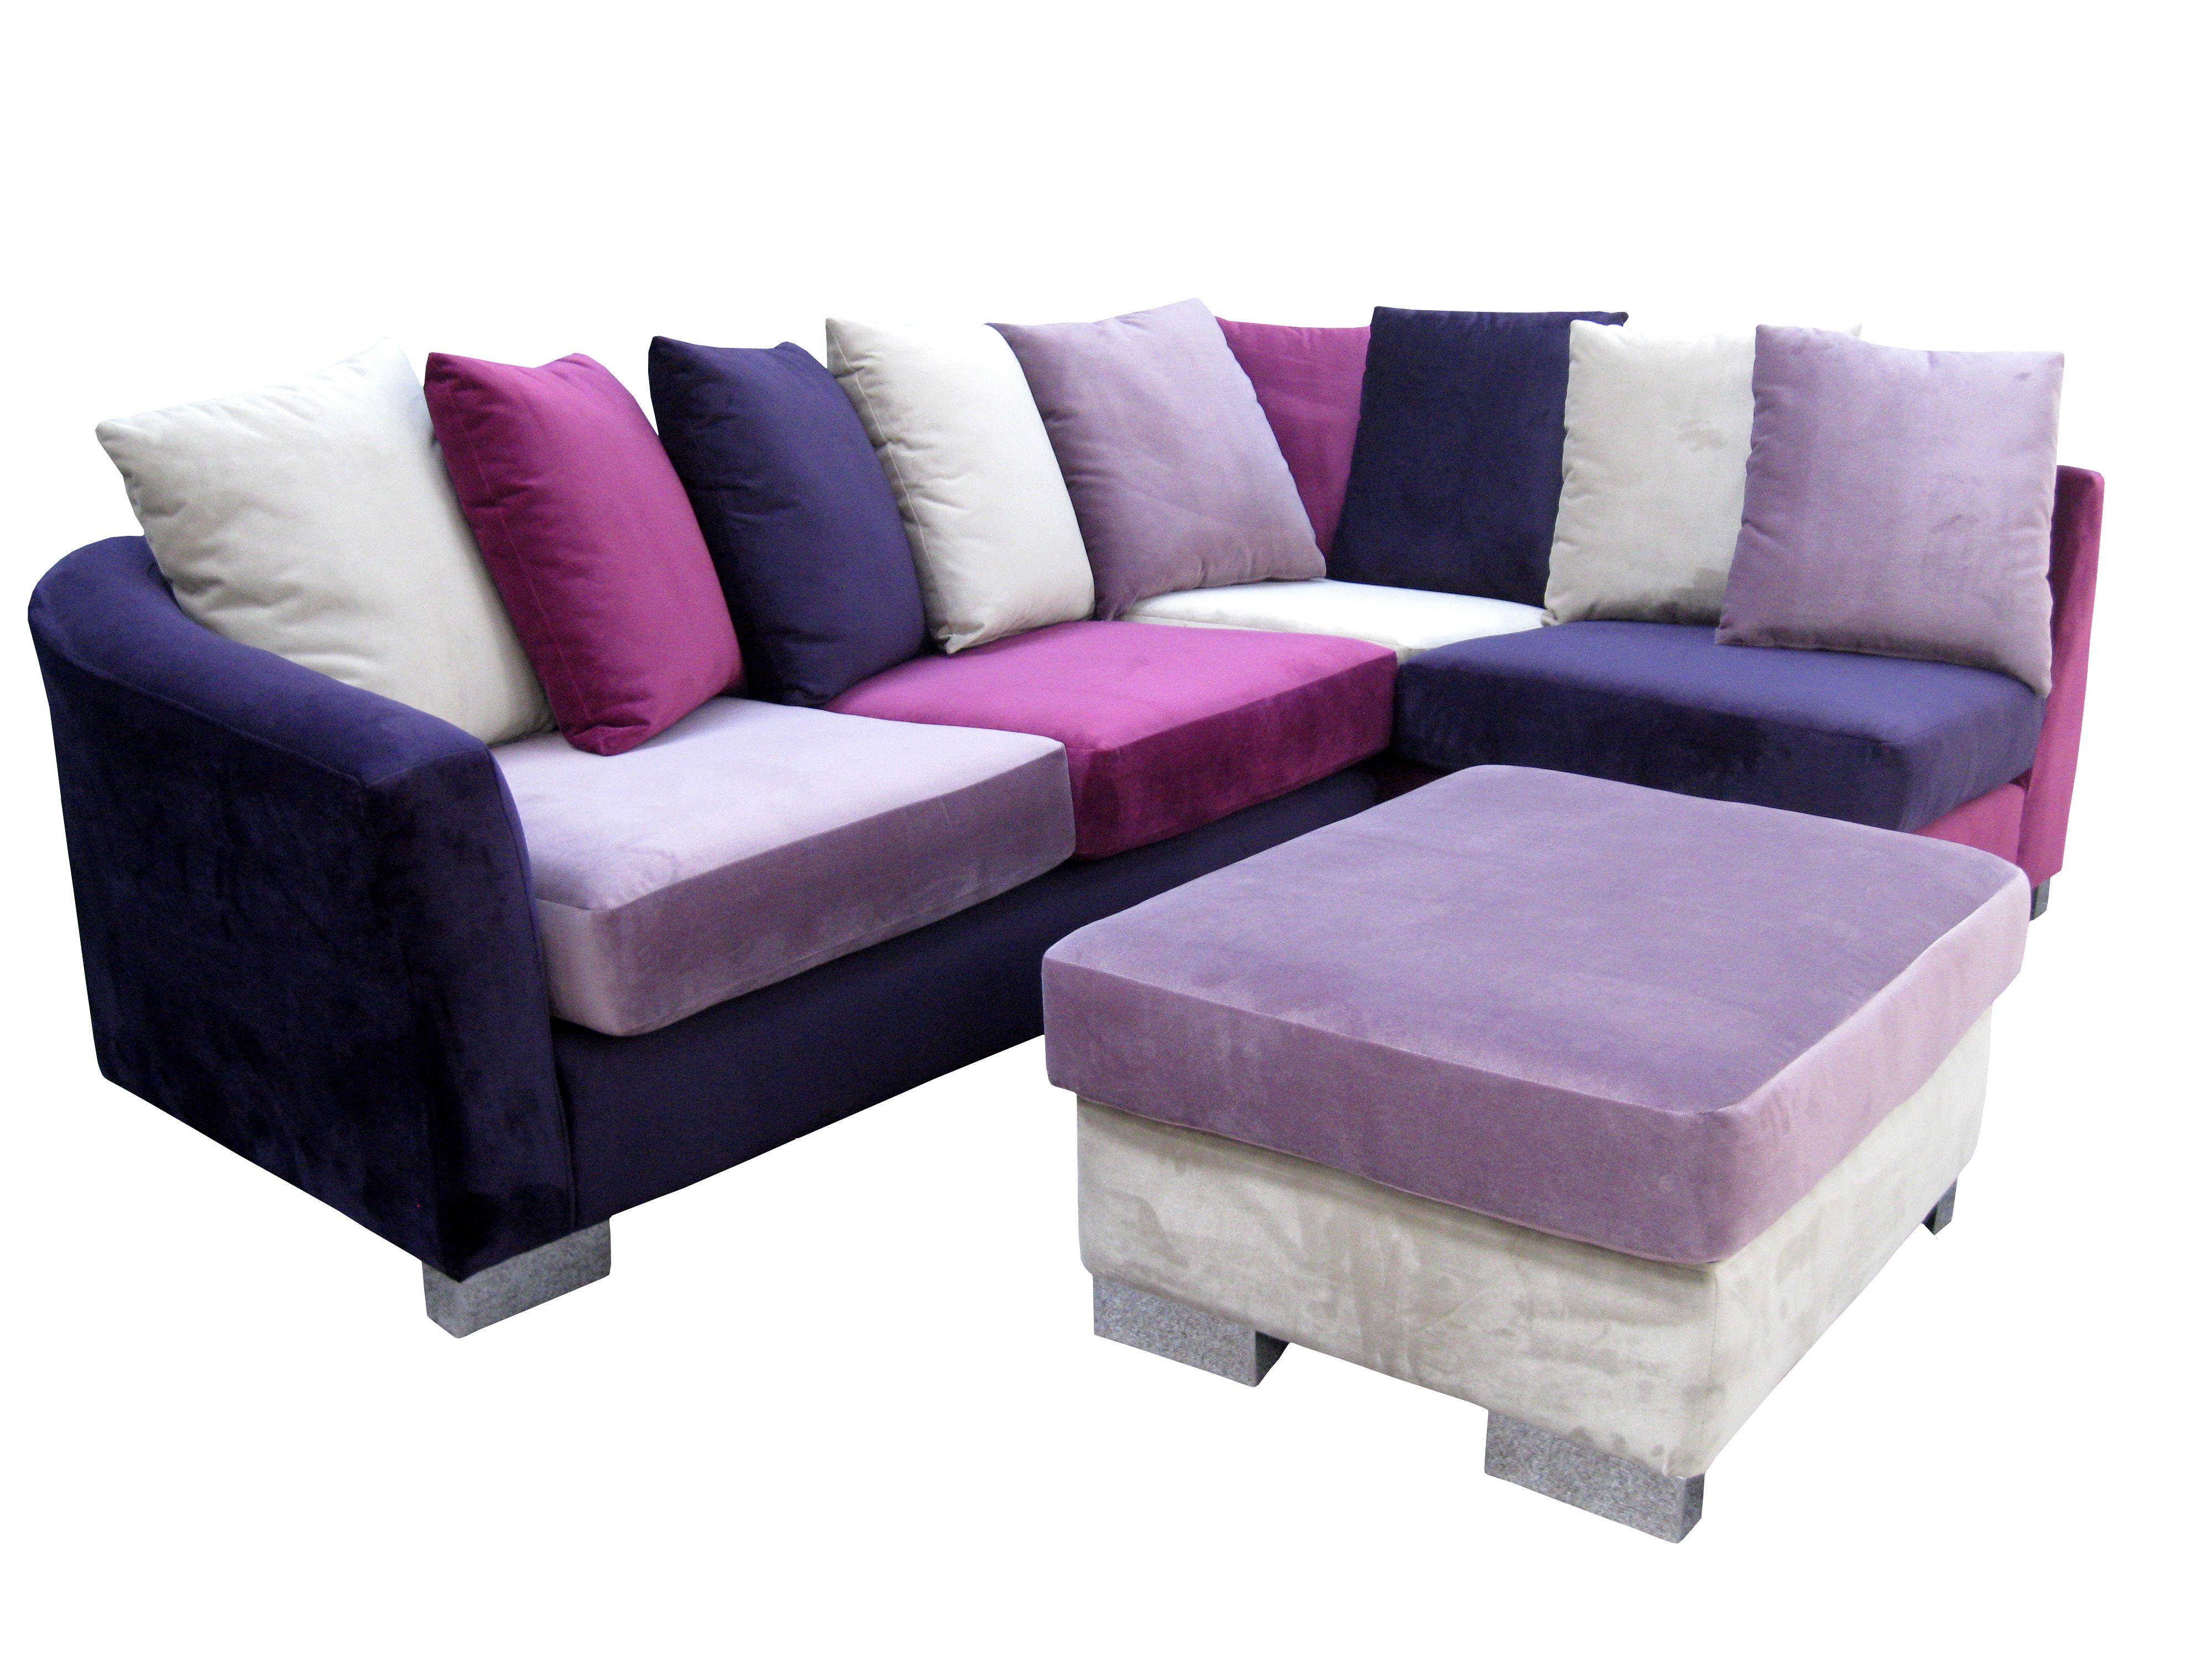 Multi Coloured Zara Corner Sofa And Footstool Corner Sofa And Footstool Corner Sofa Outdoor Furniture Sets